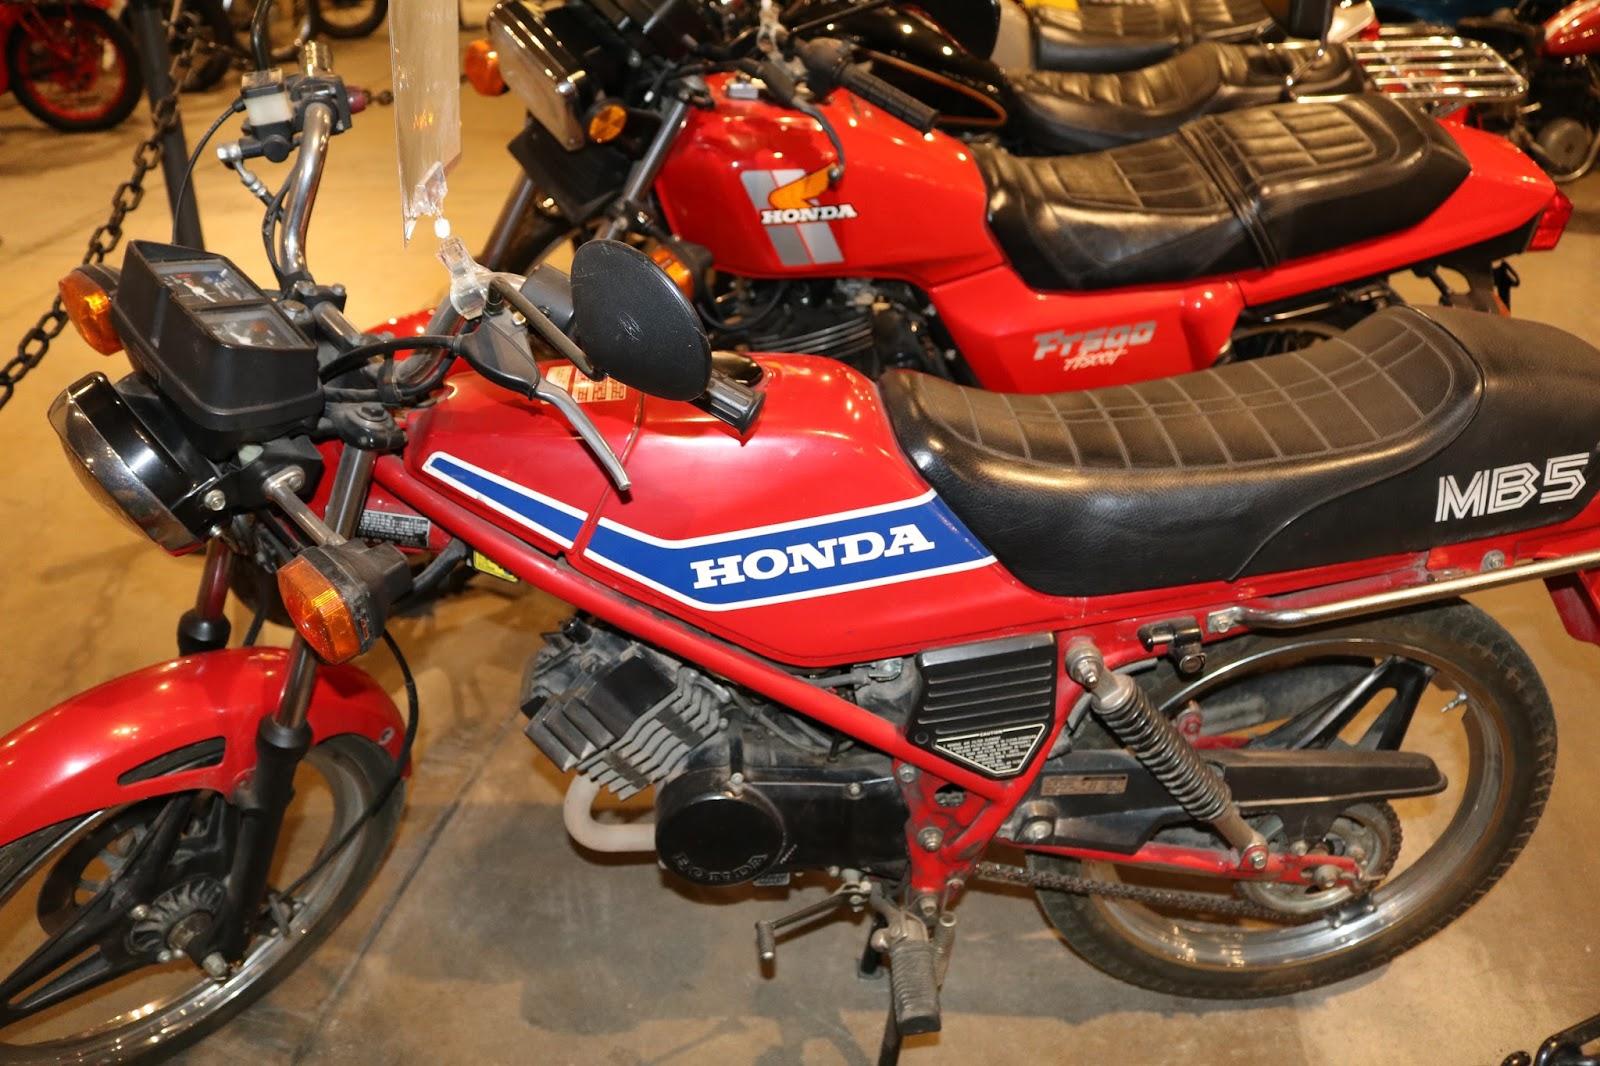 oldmotodude 1982 honda mb5 on display at the forney